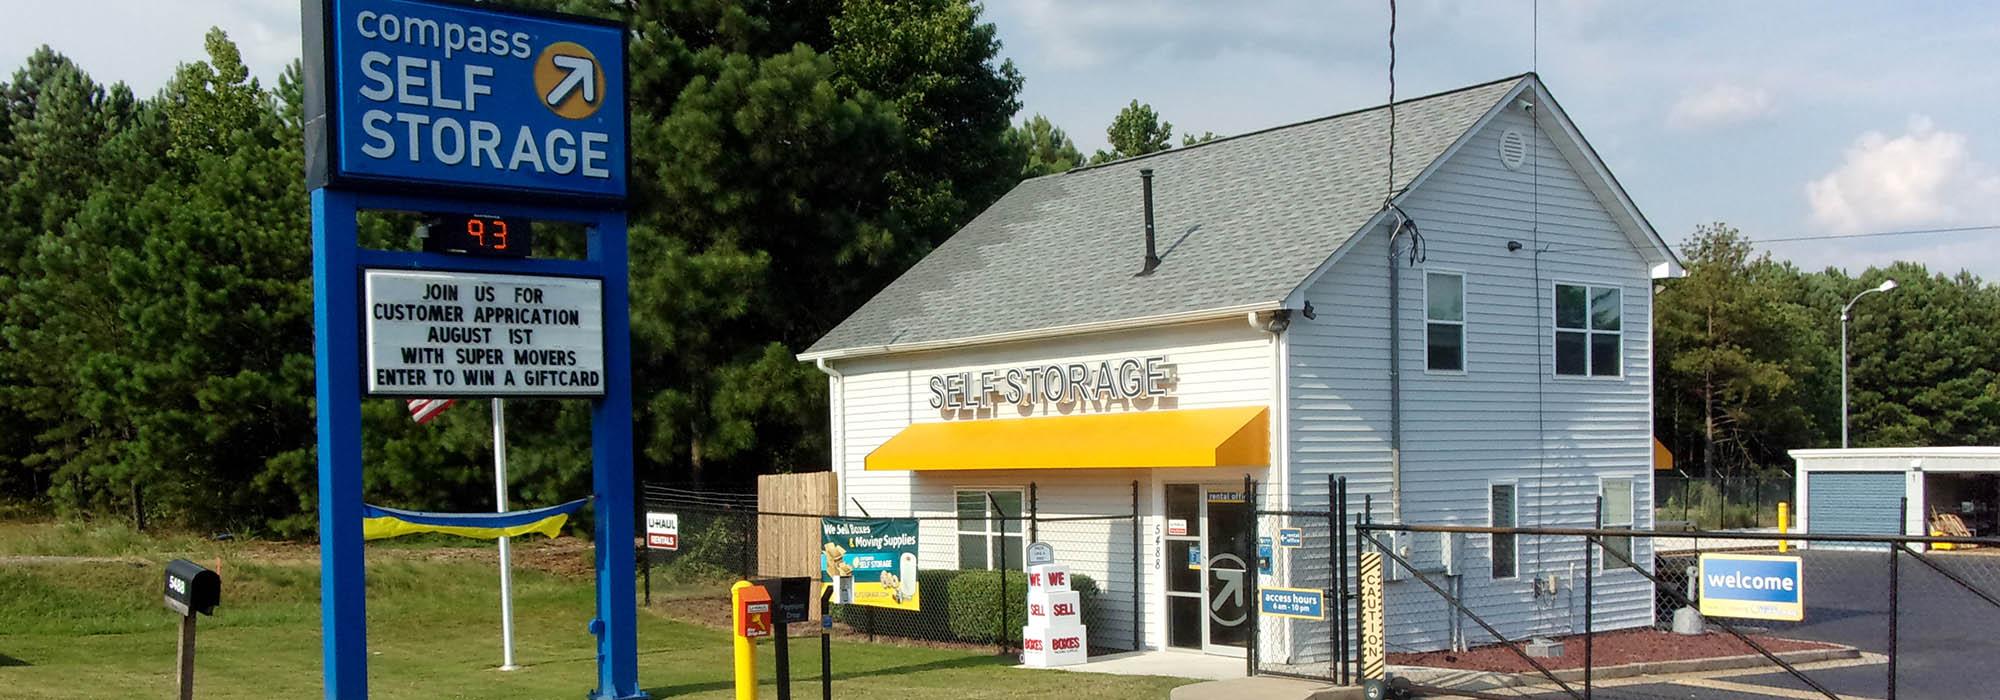 Self storage in Acworth GA